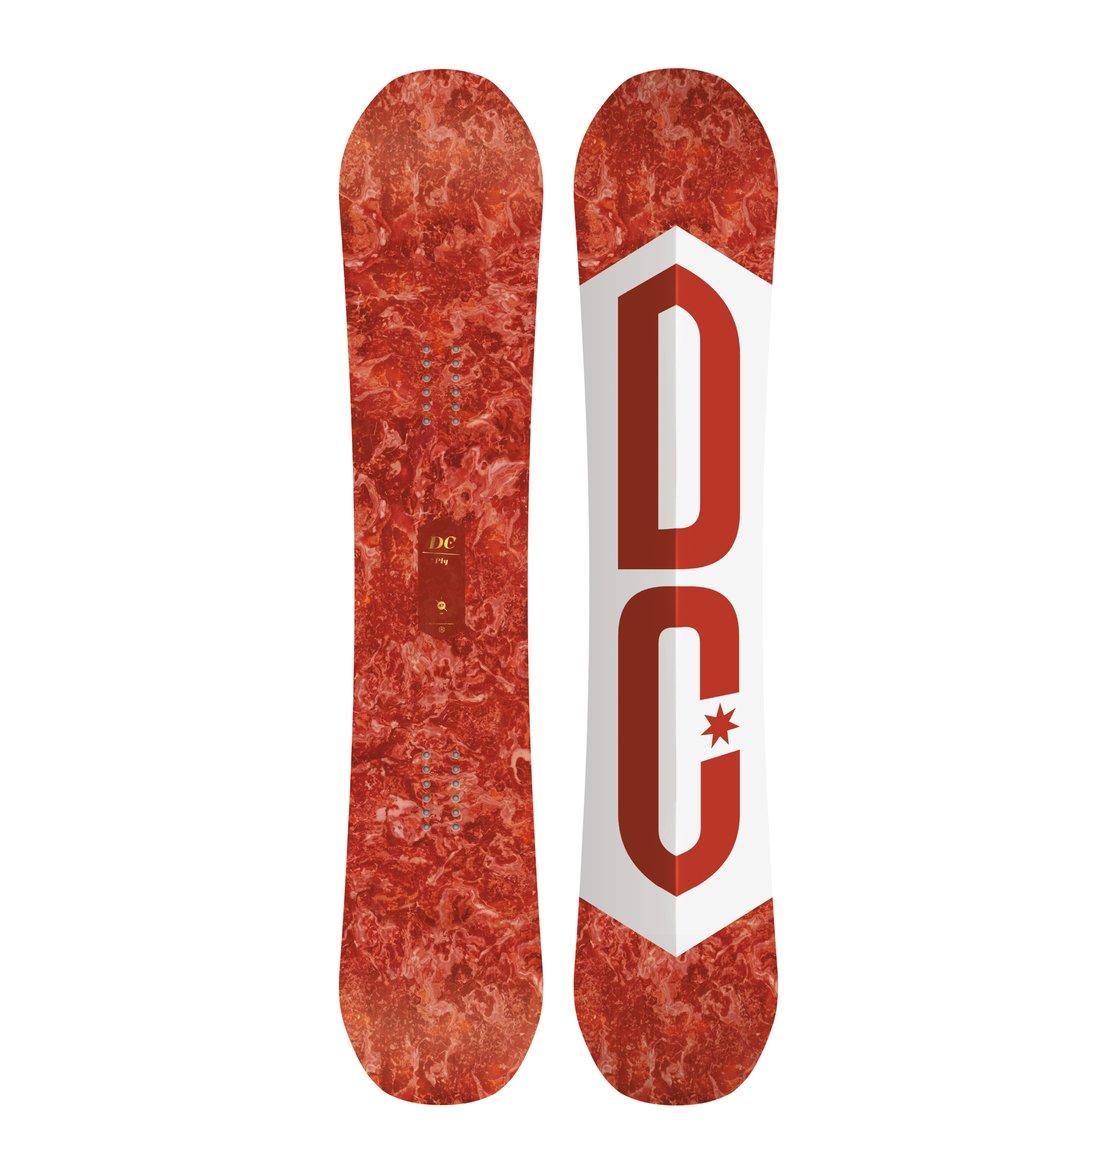 Сноуборд Ply от DC Shoes